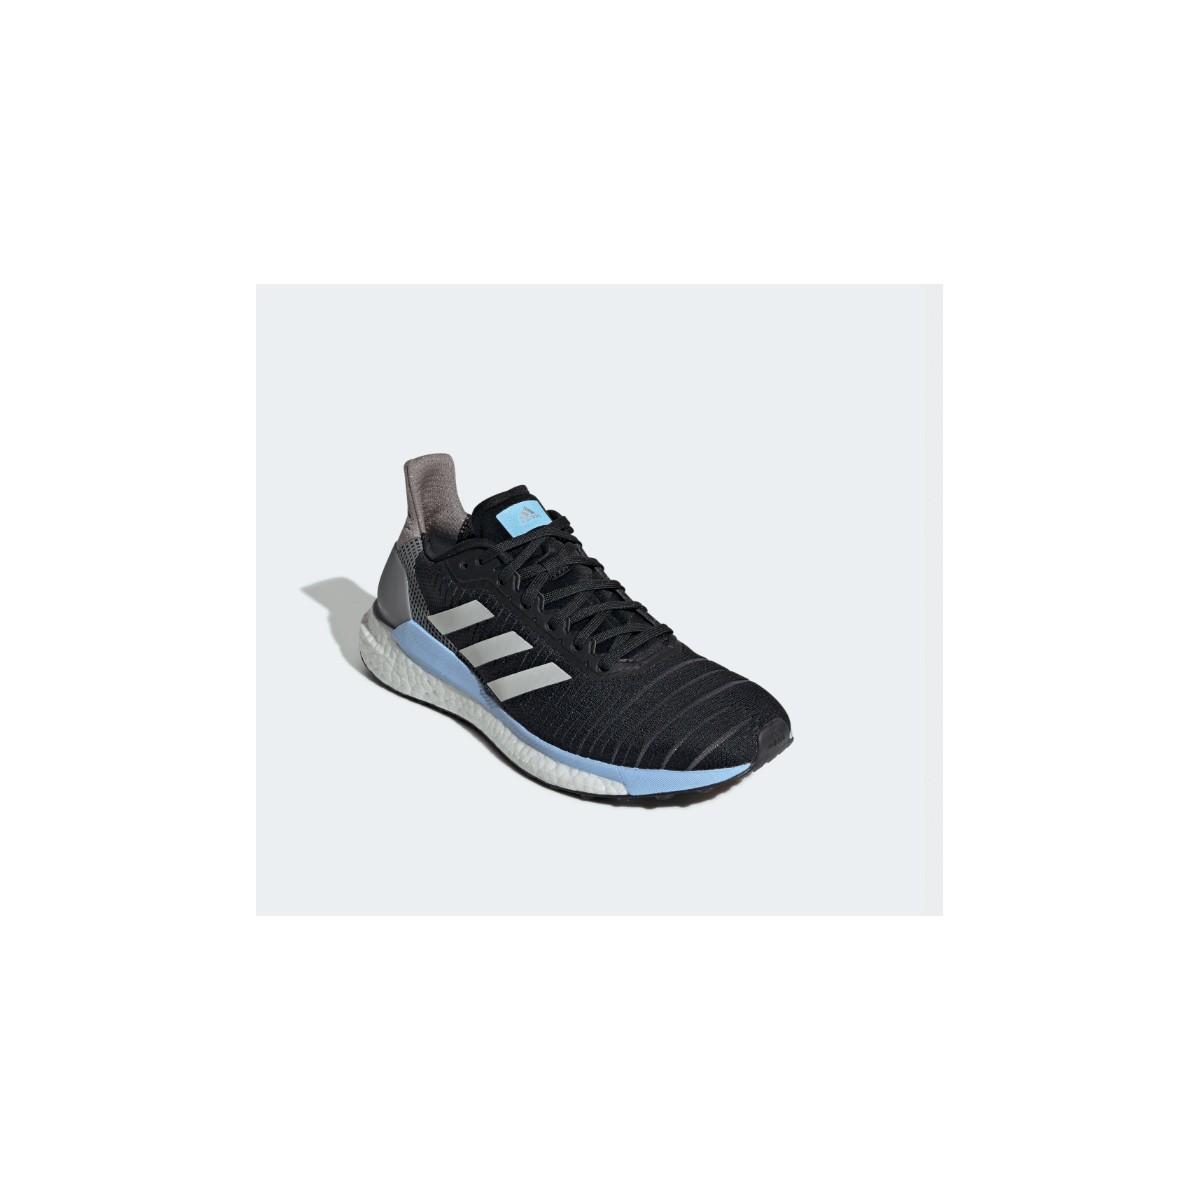 Zapatillas Adidas Solar Boost 19 Negro Gris OI19 Mujer